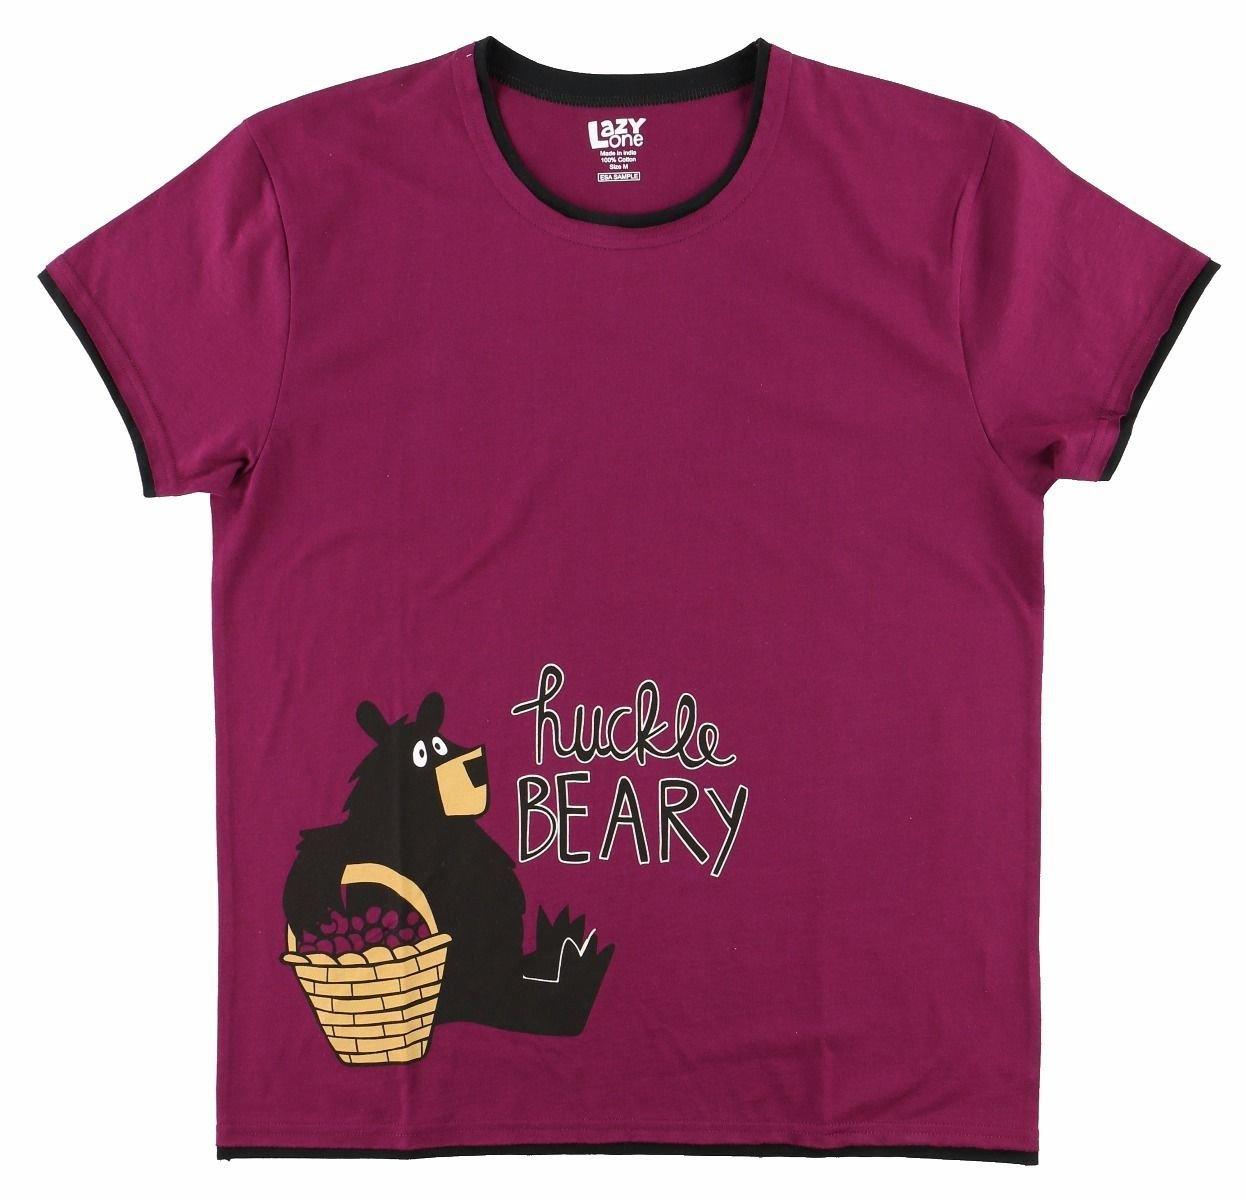 Pyjamastopp Huckle-Berry